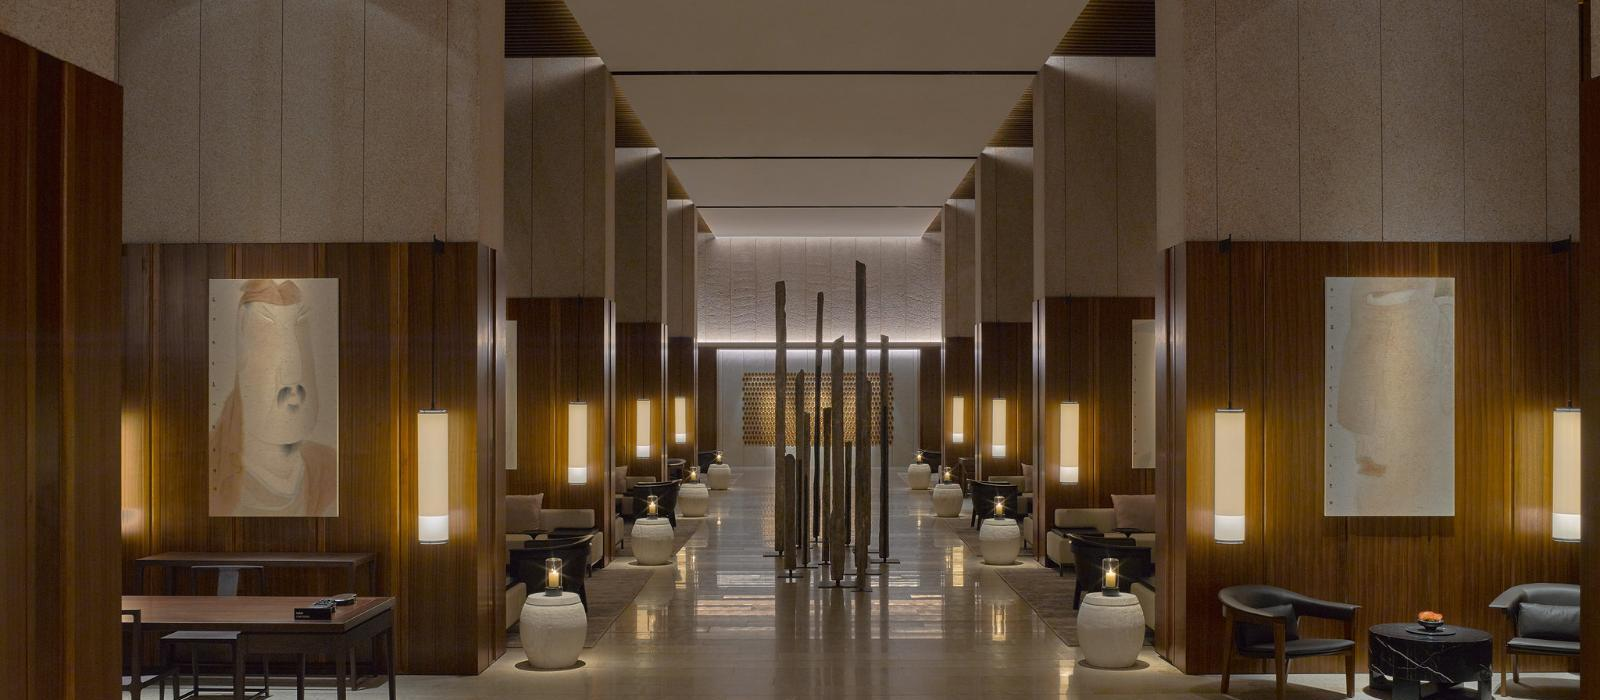 七尚酒店(Lohkah Hotel & Spa) 图片  www.lhw.cn